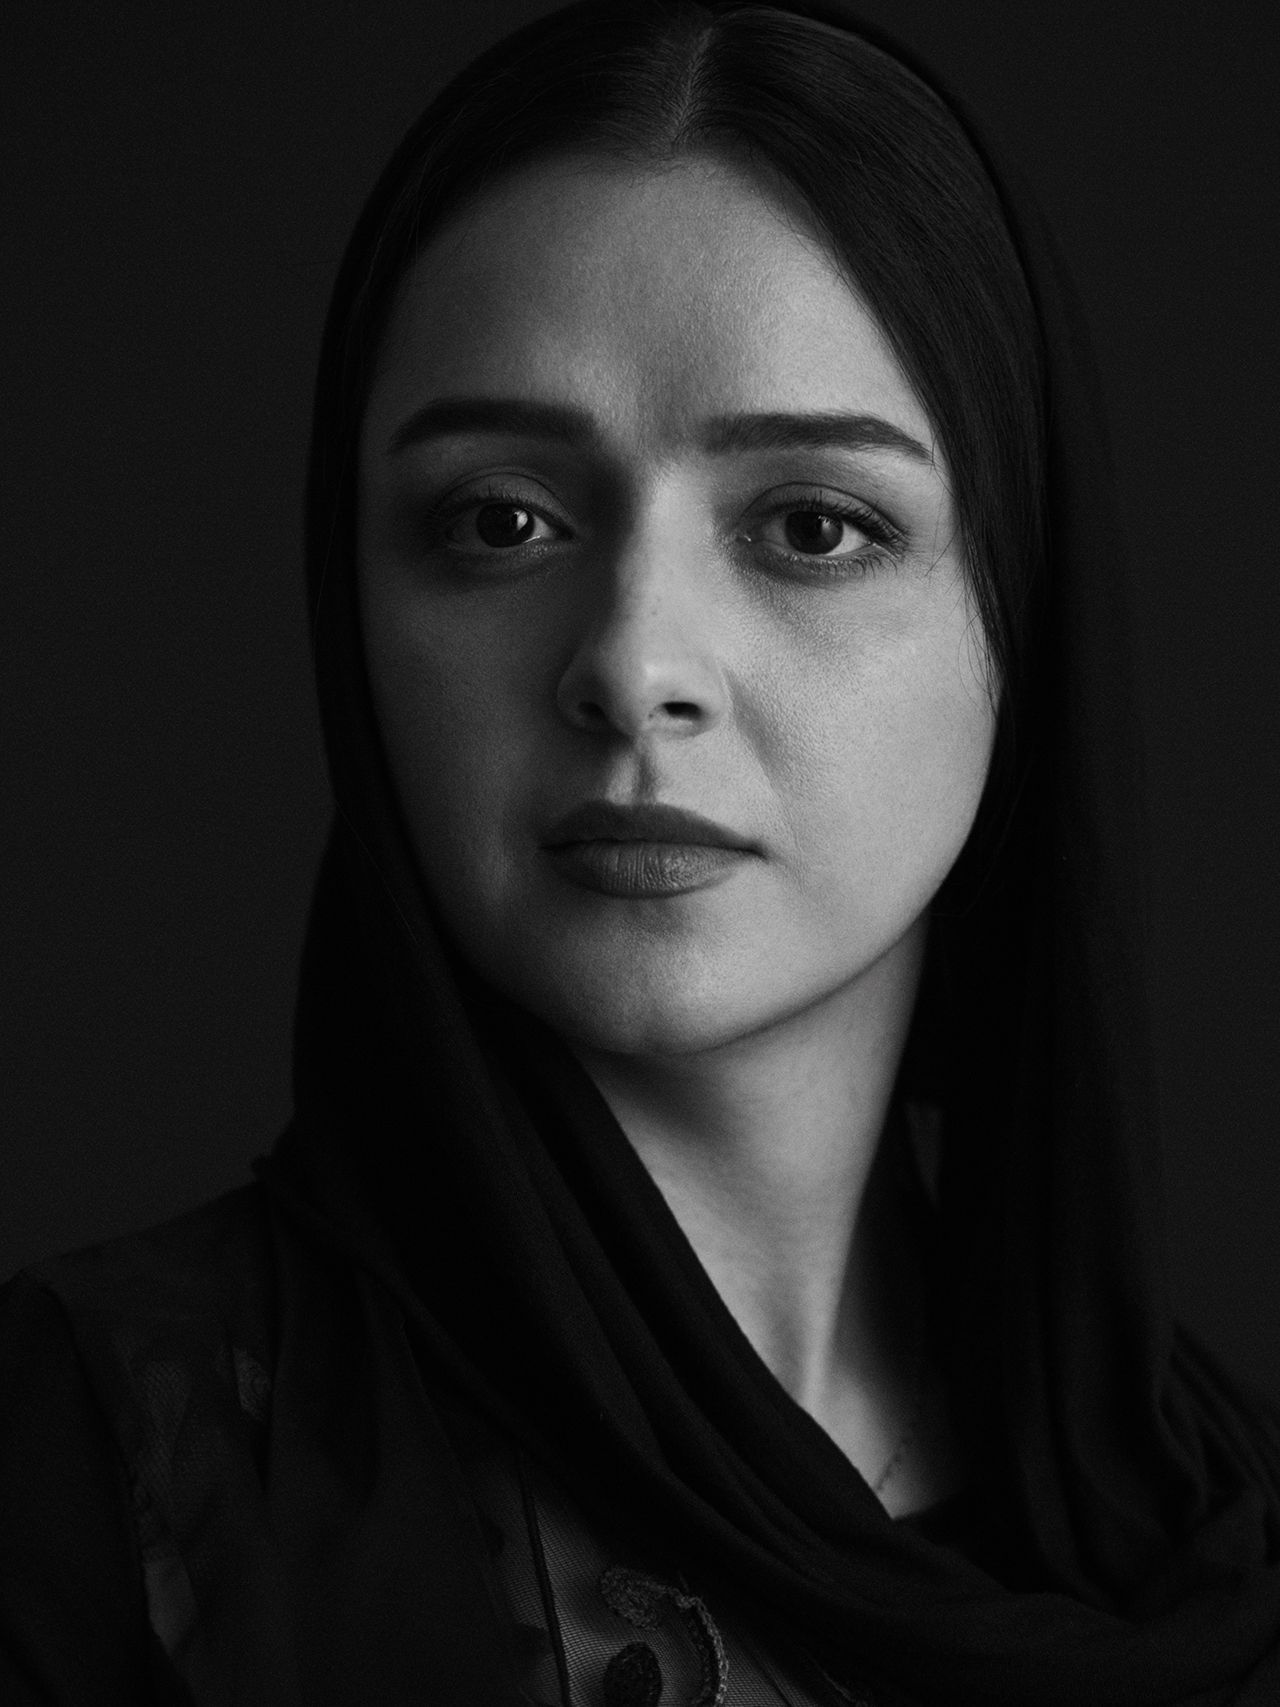 Taraneh Alidoosti In 2019 Taraneh Alidoosti Persian Girls